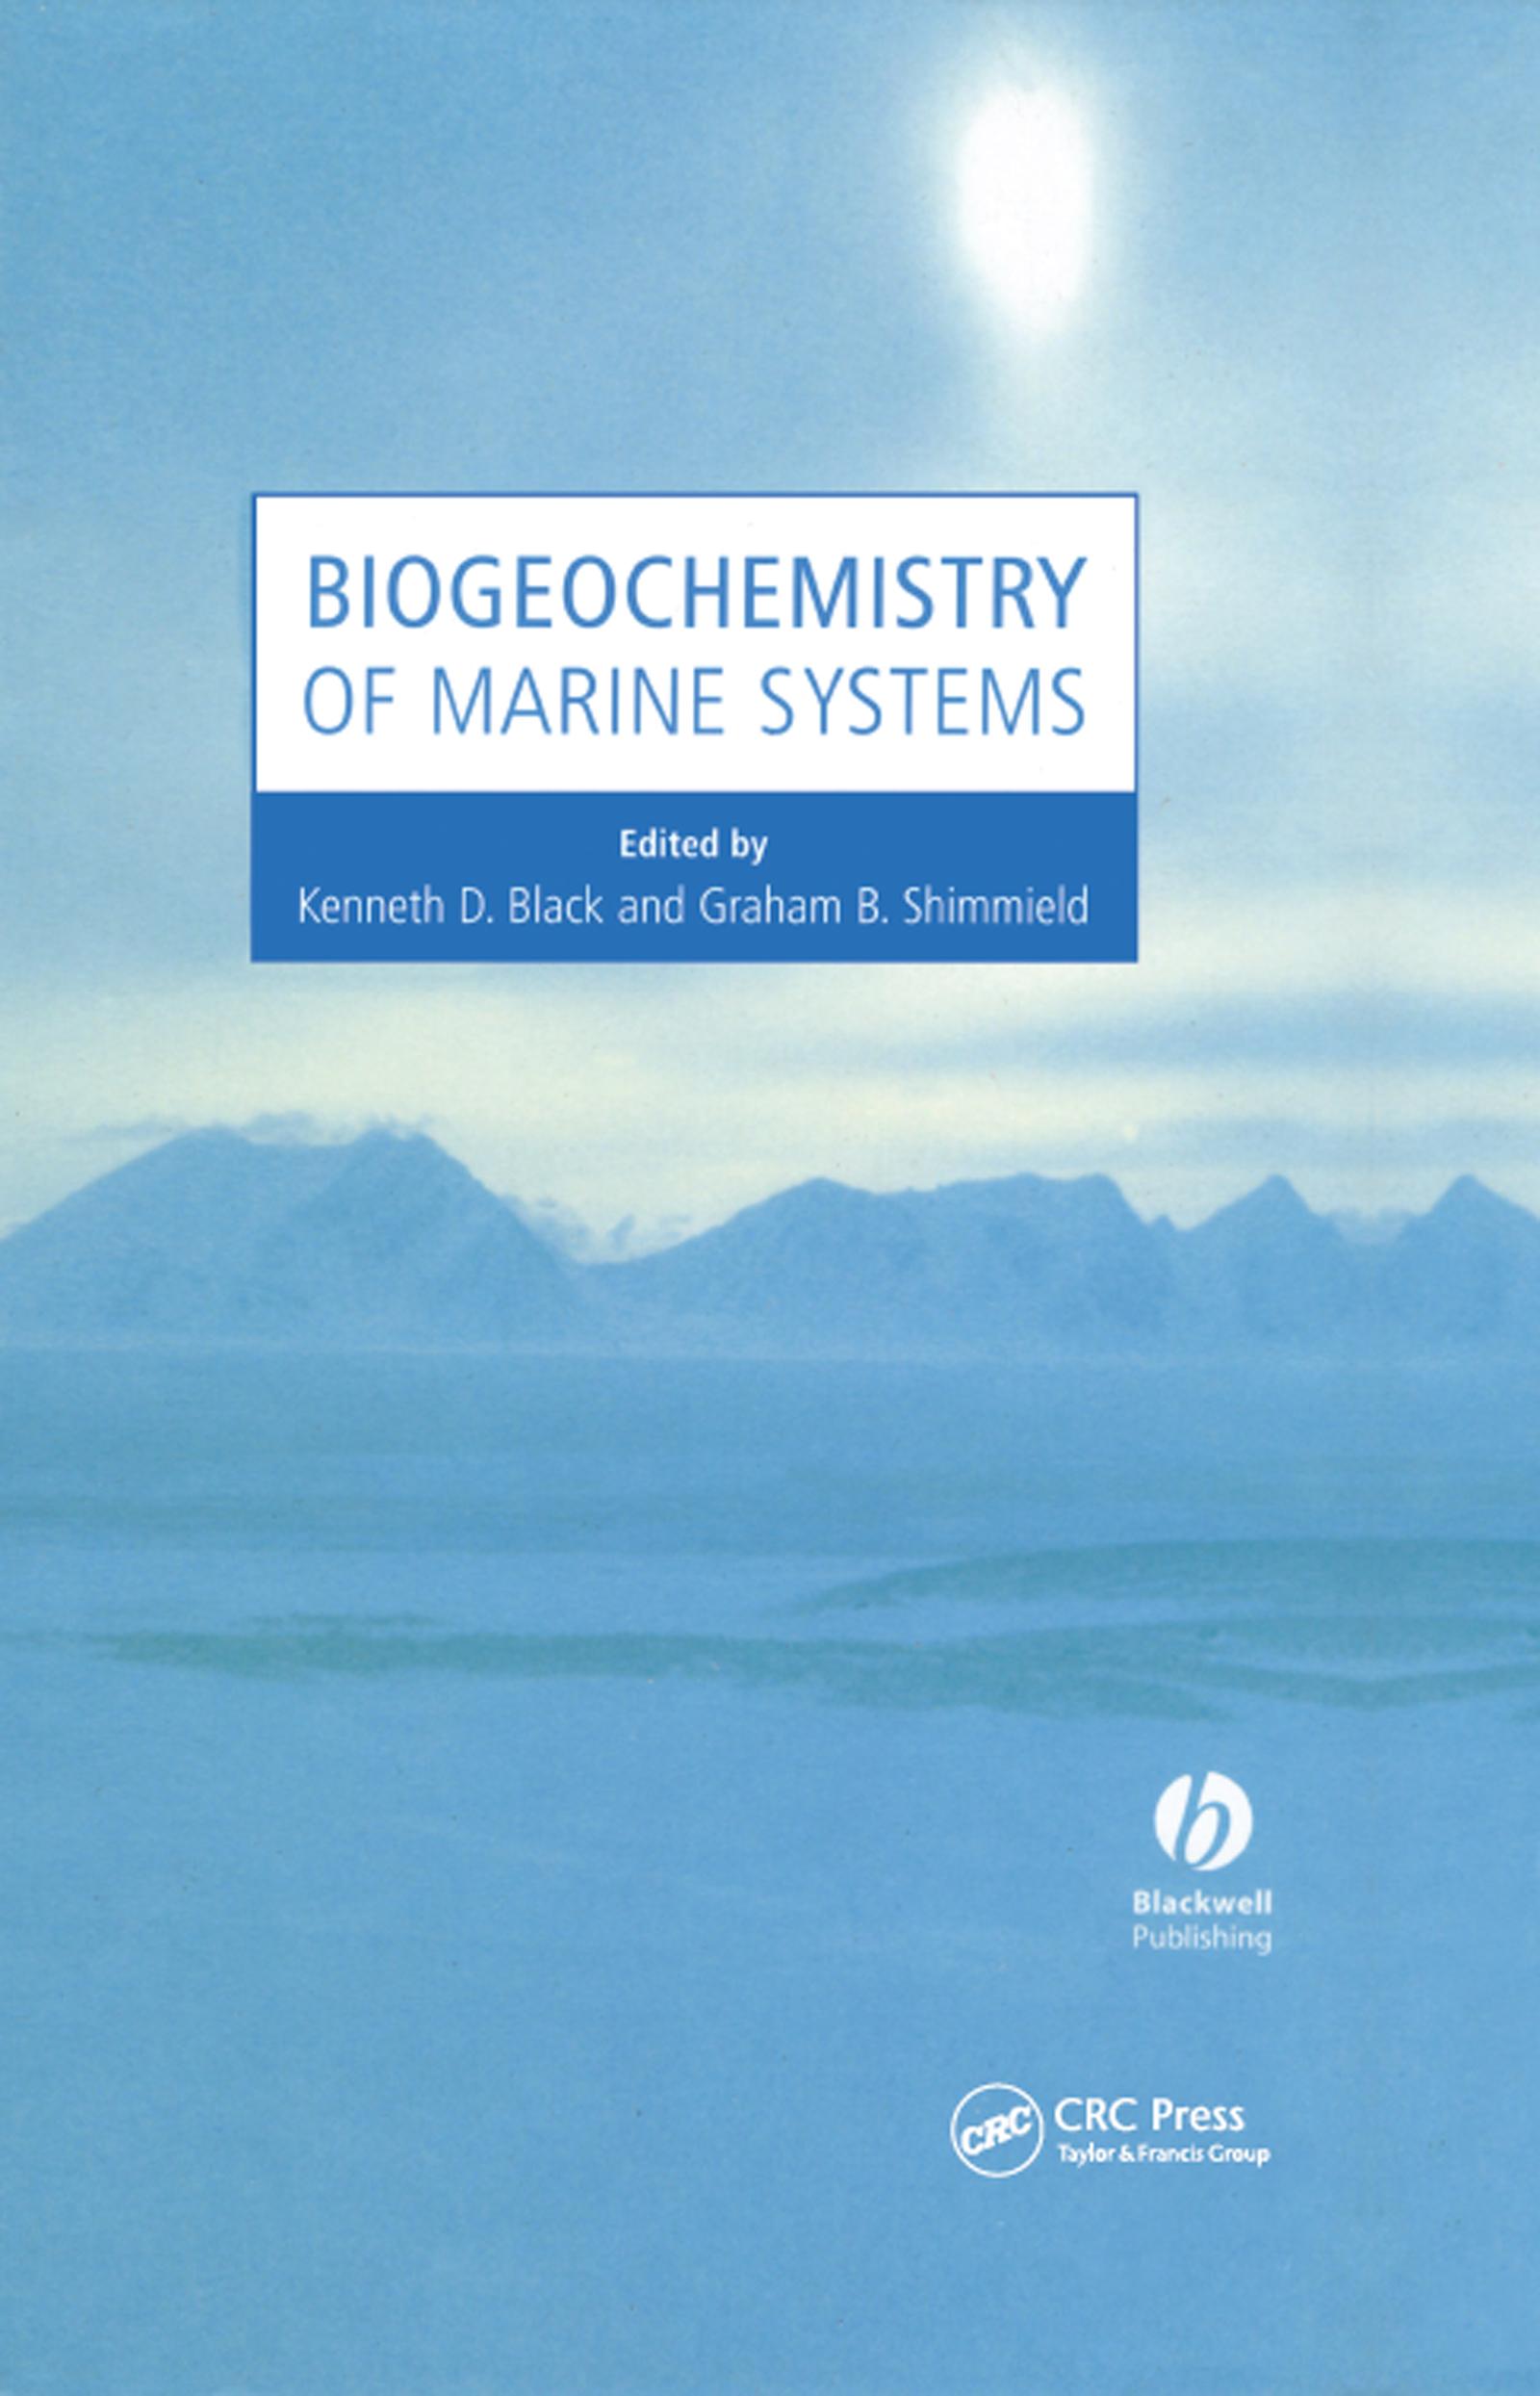 Biogeochemistry of Marine Systems